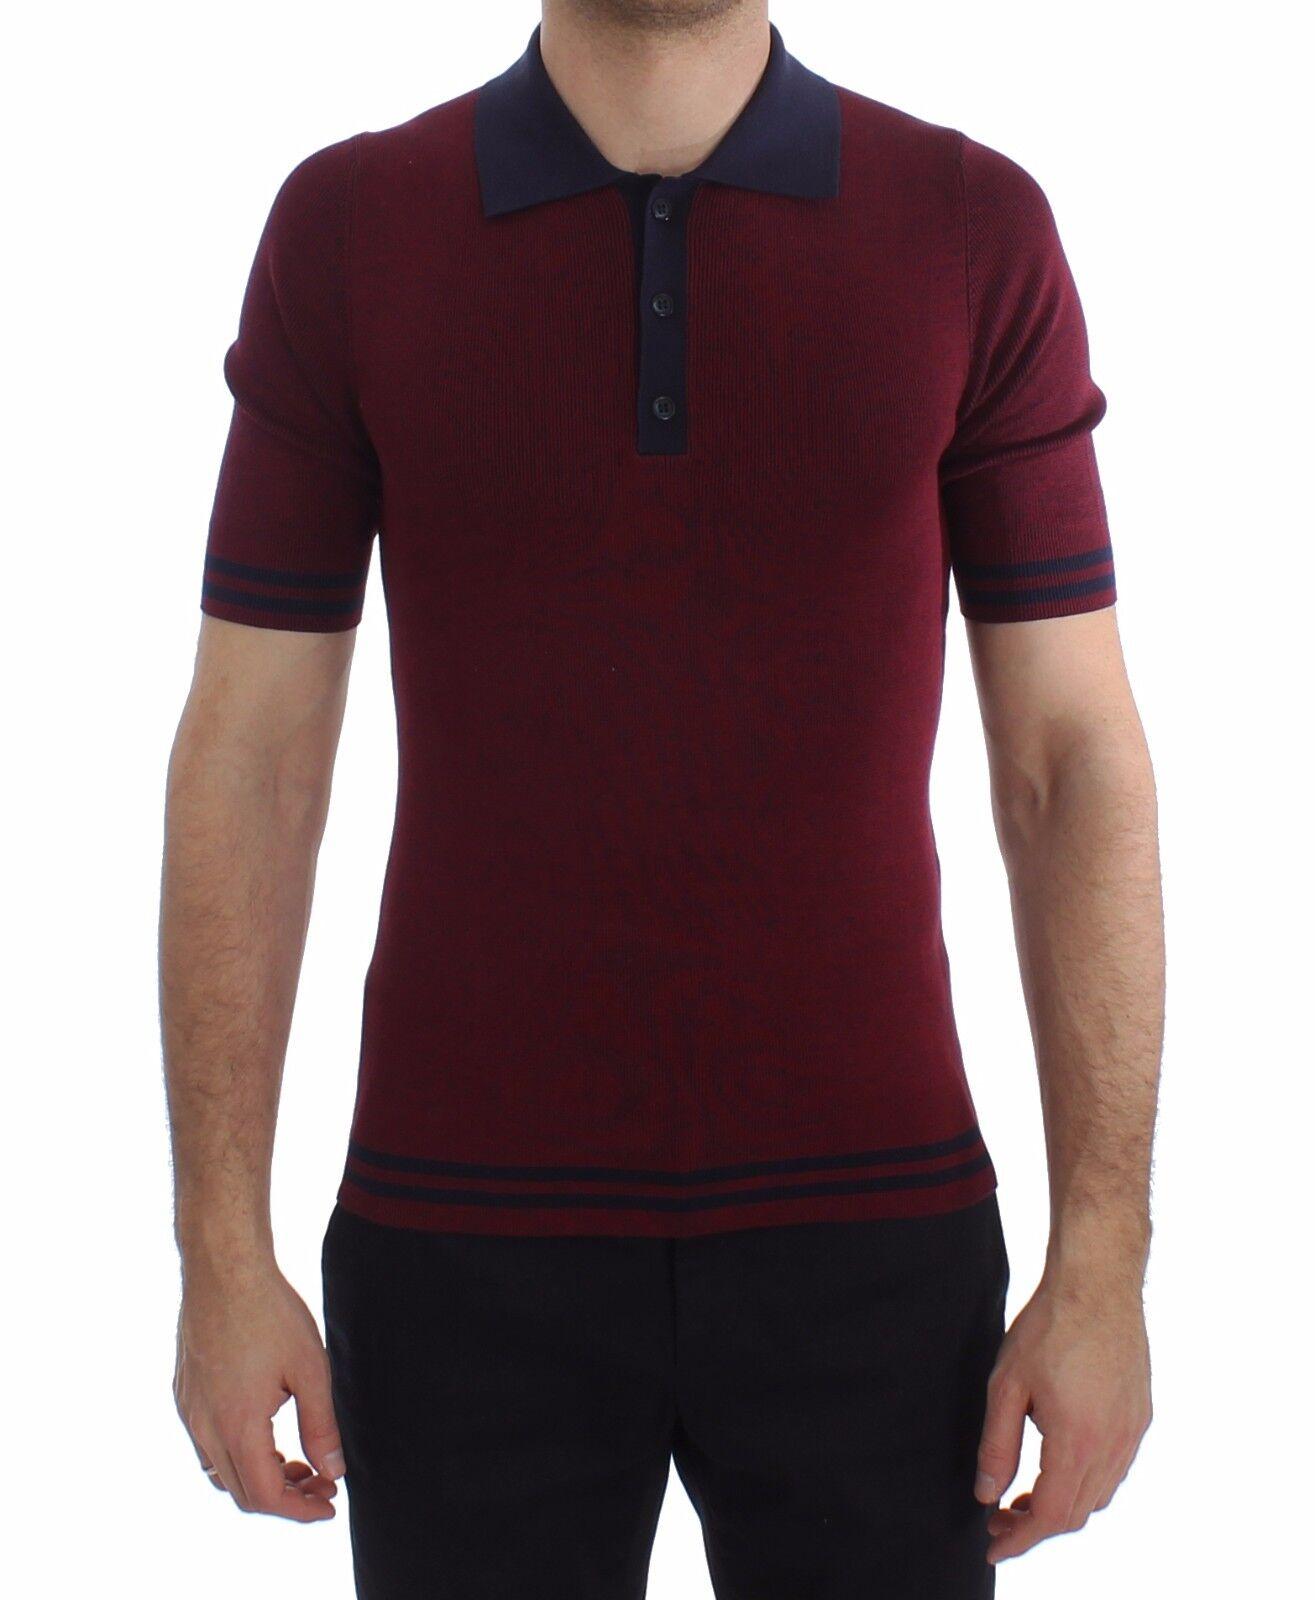 NEW DOLCE & GABBANA T-shirt Bordeaux Blau Silk Polo Top  Herren IT46/US36 / S